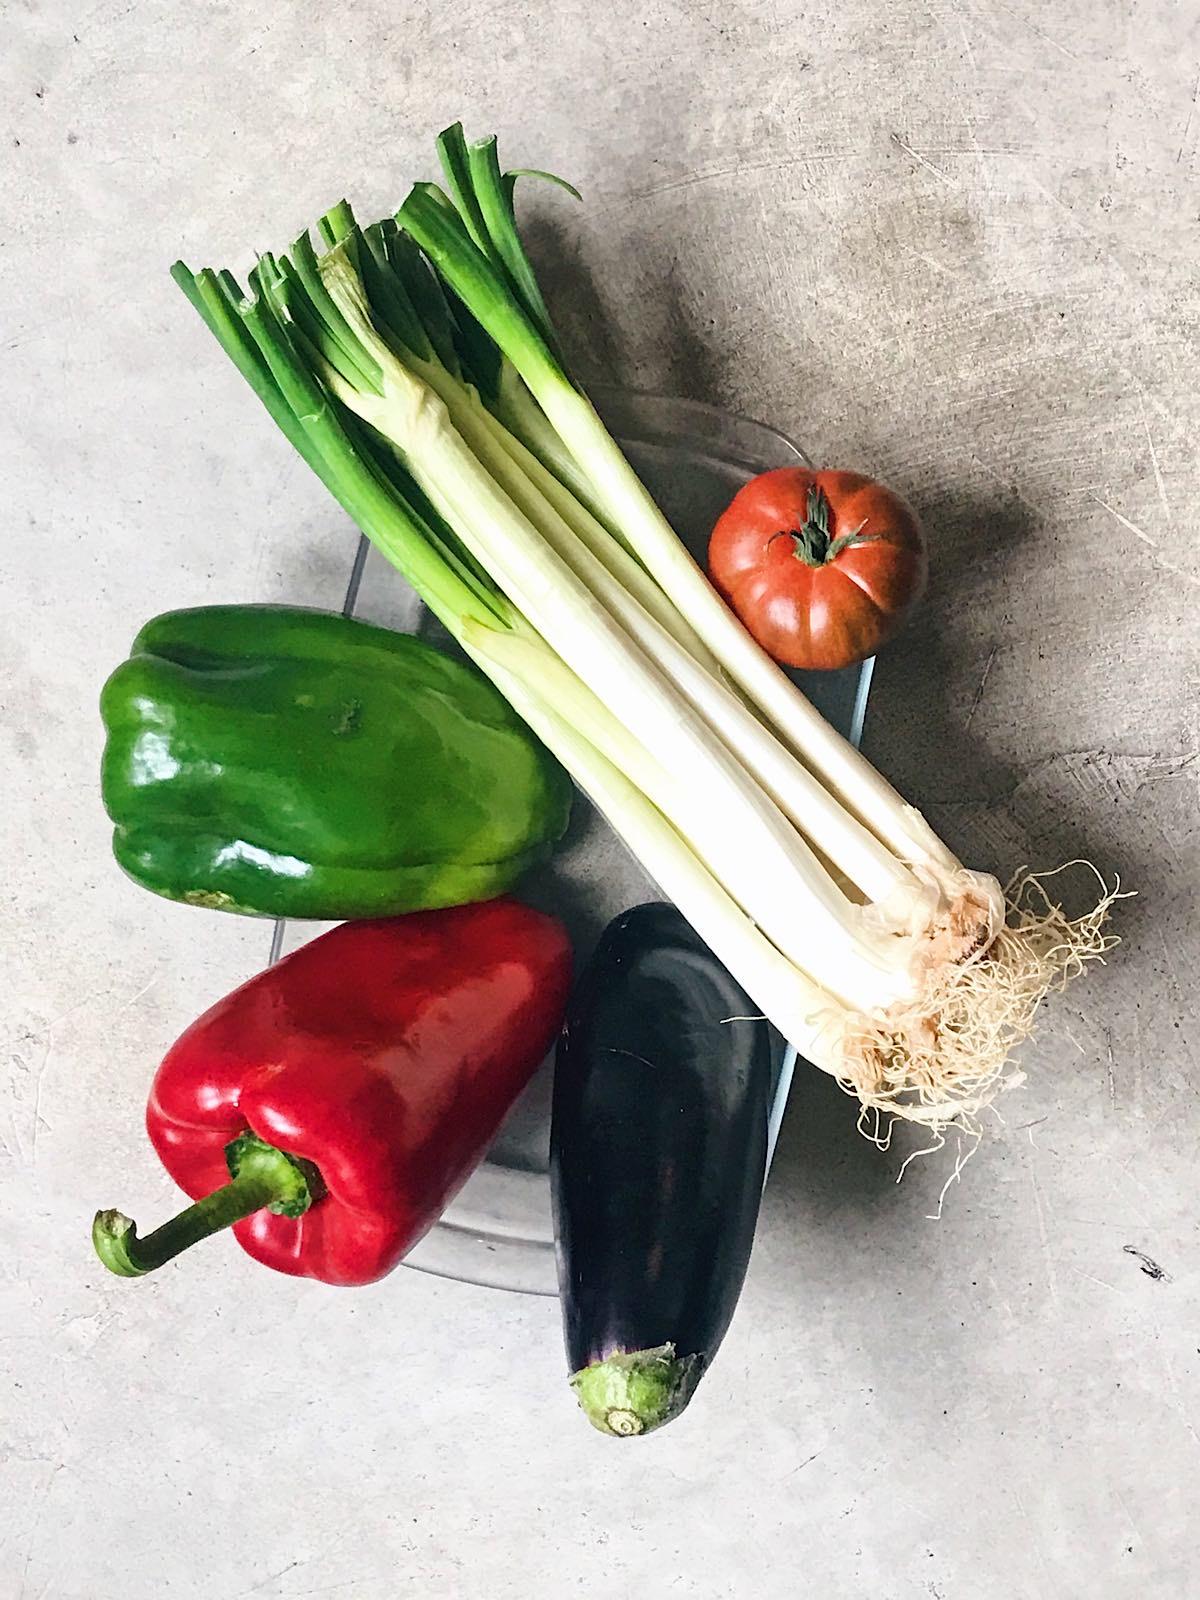 ingredientes de receta de verduras asadas